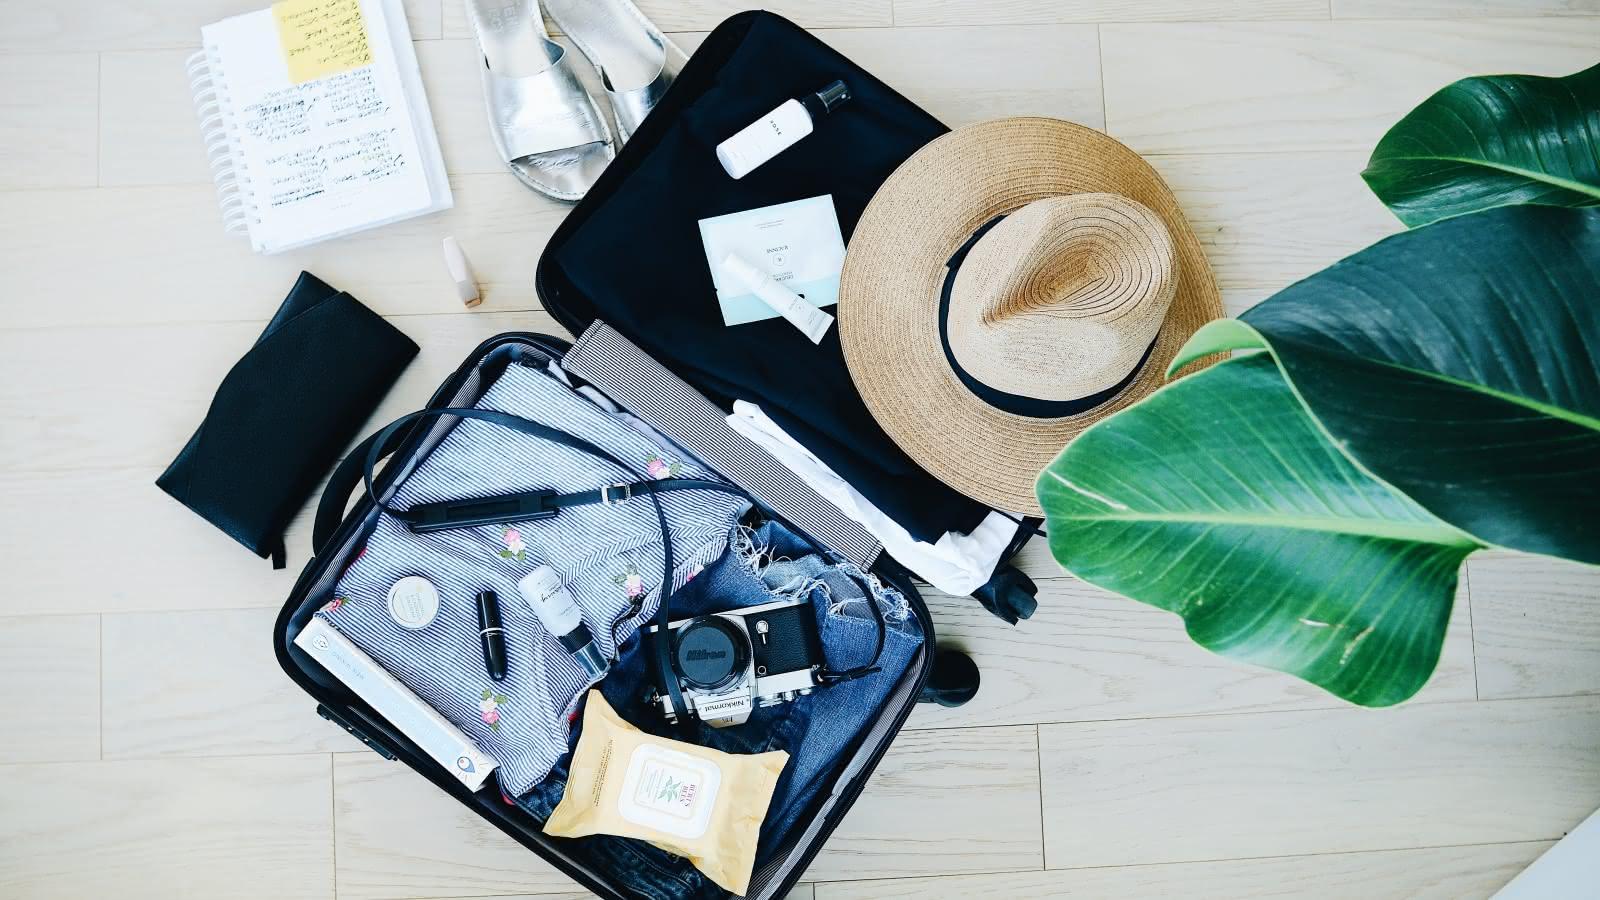 SANDEMANs Travel Guides